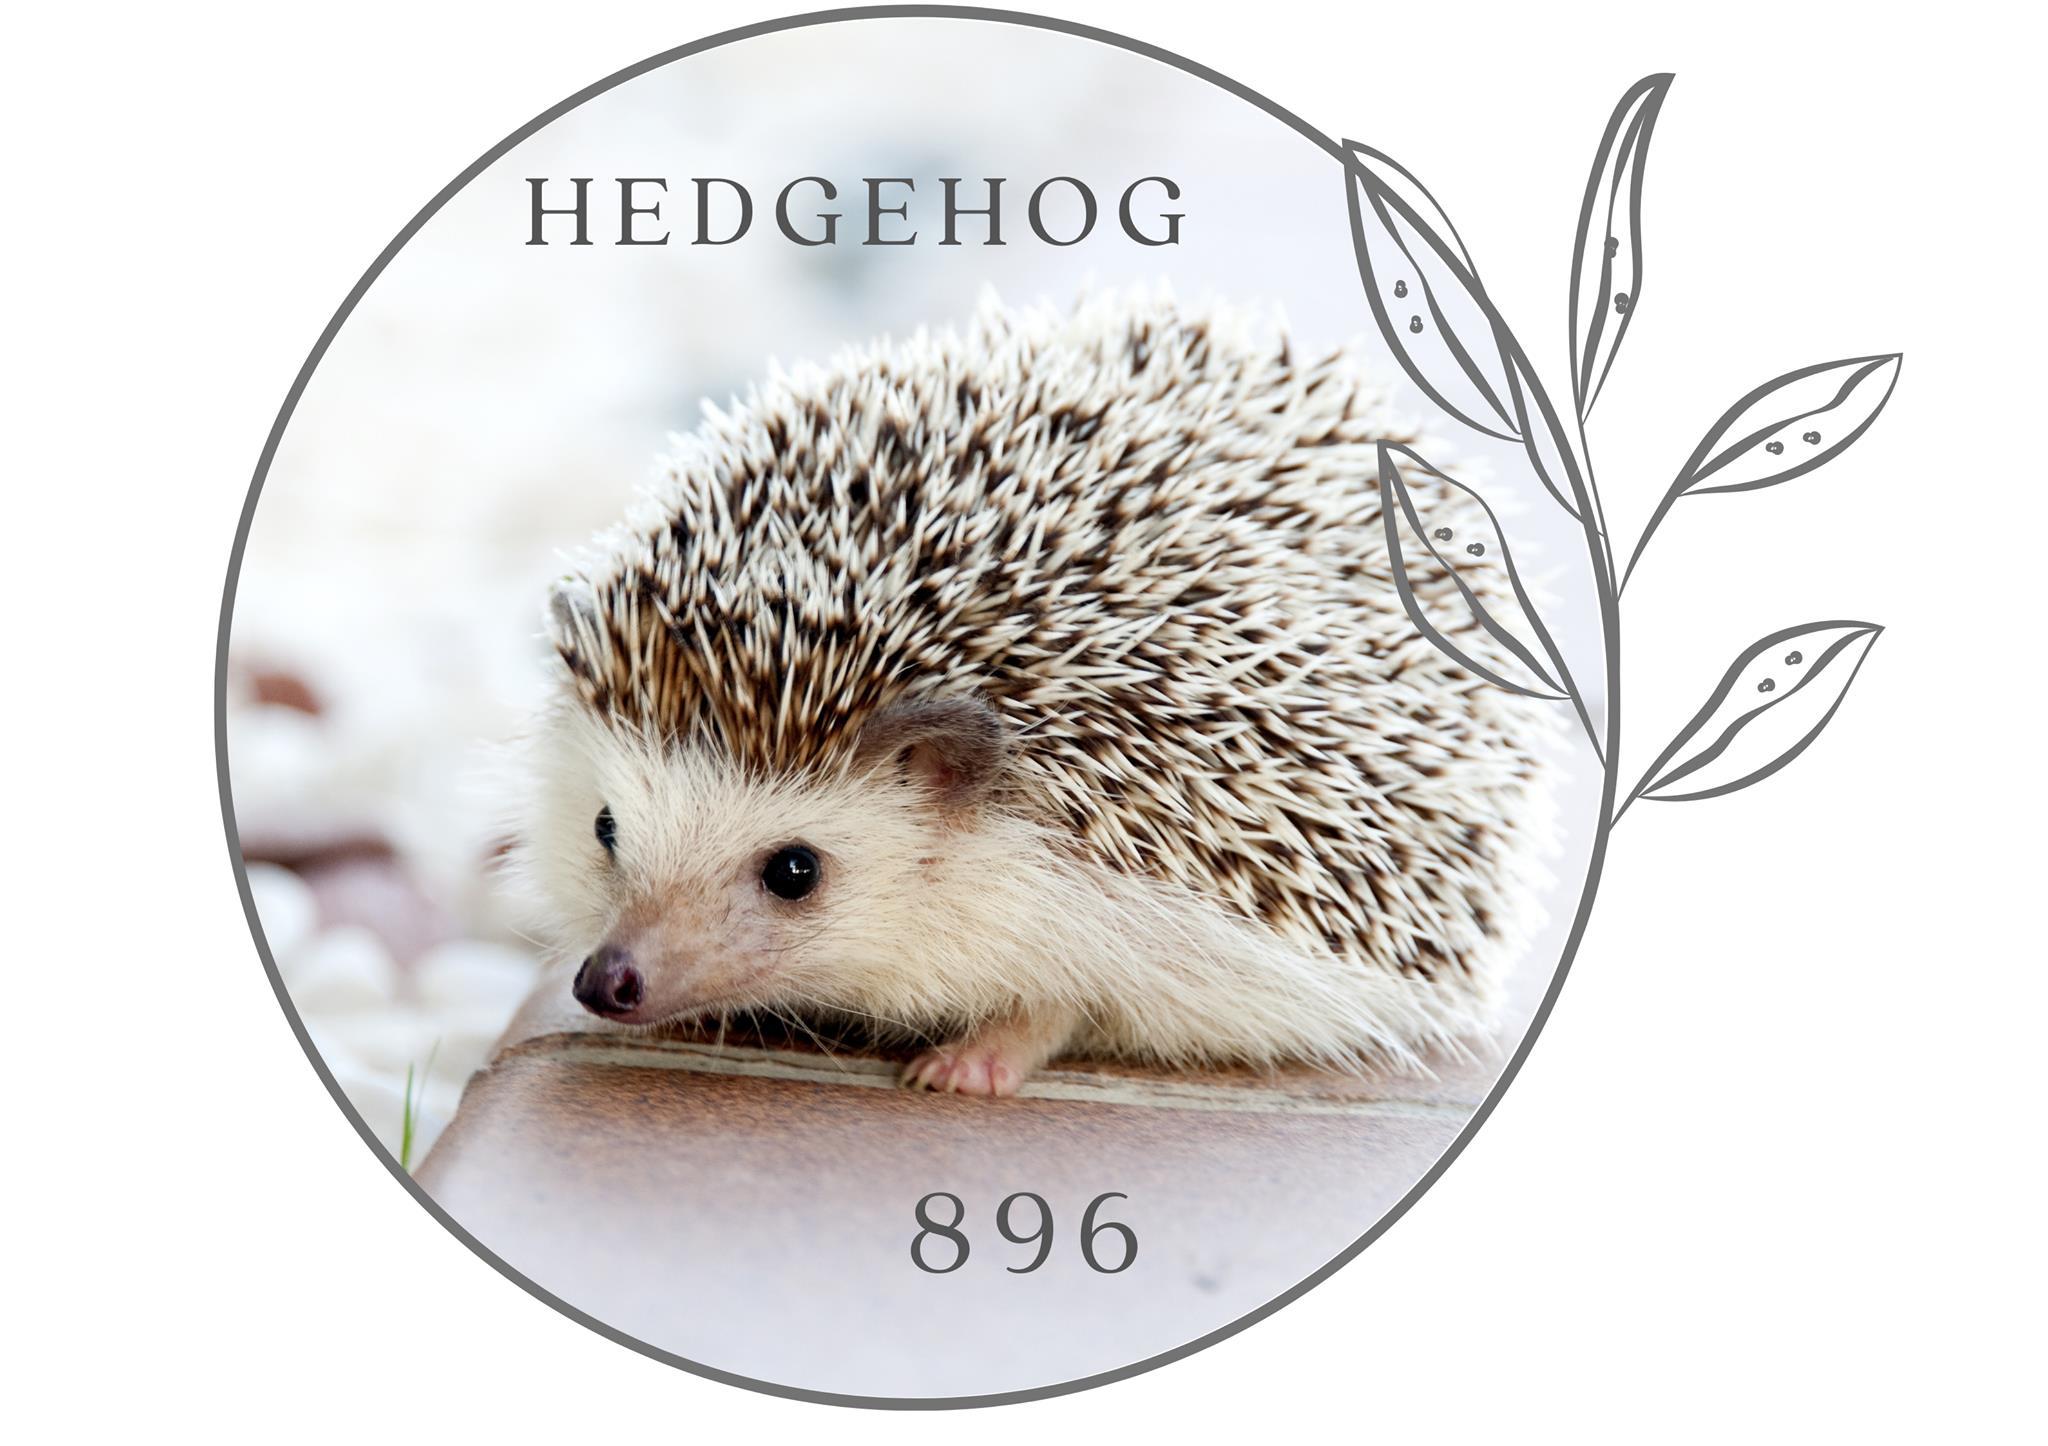 Hedgehog 896 - Marloth Park